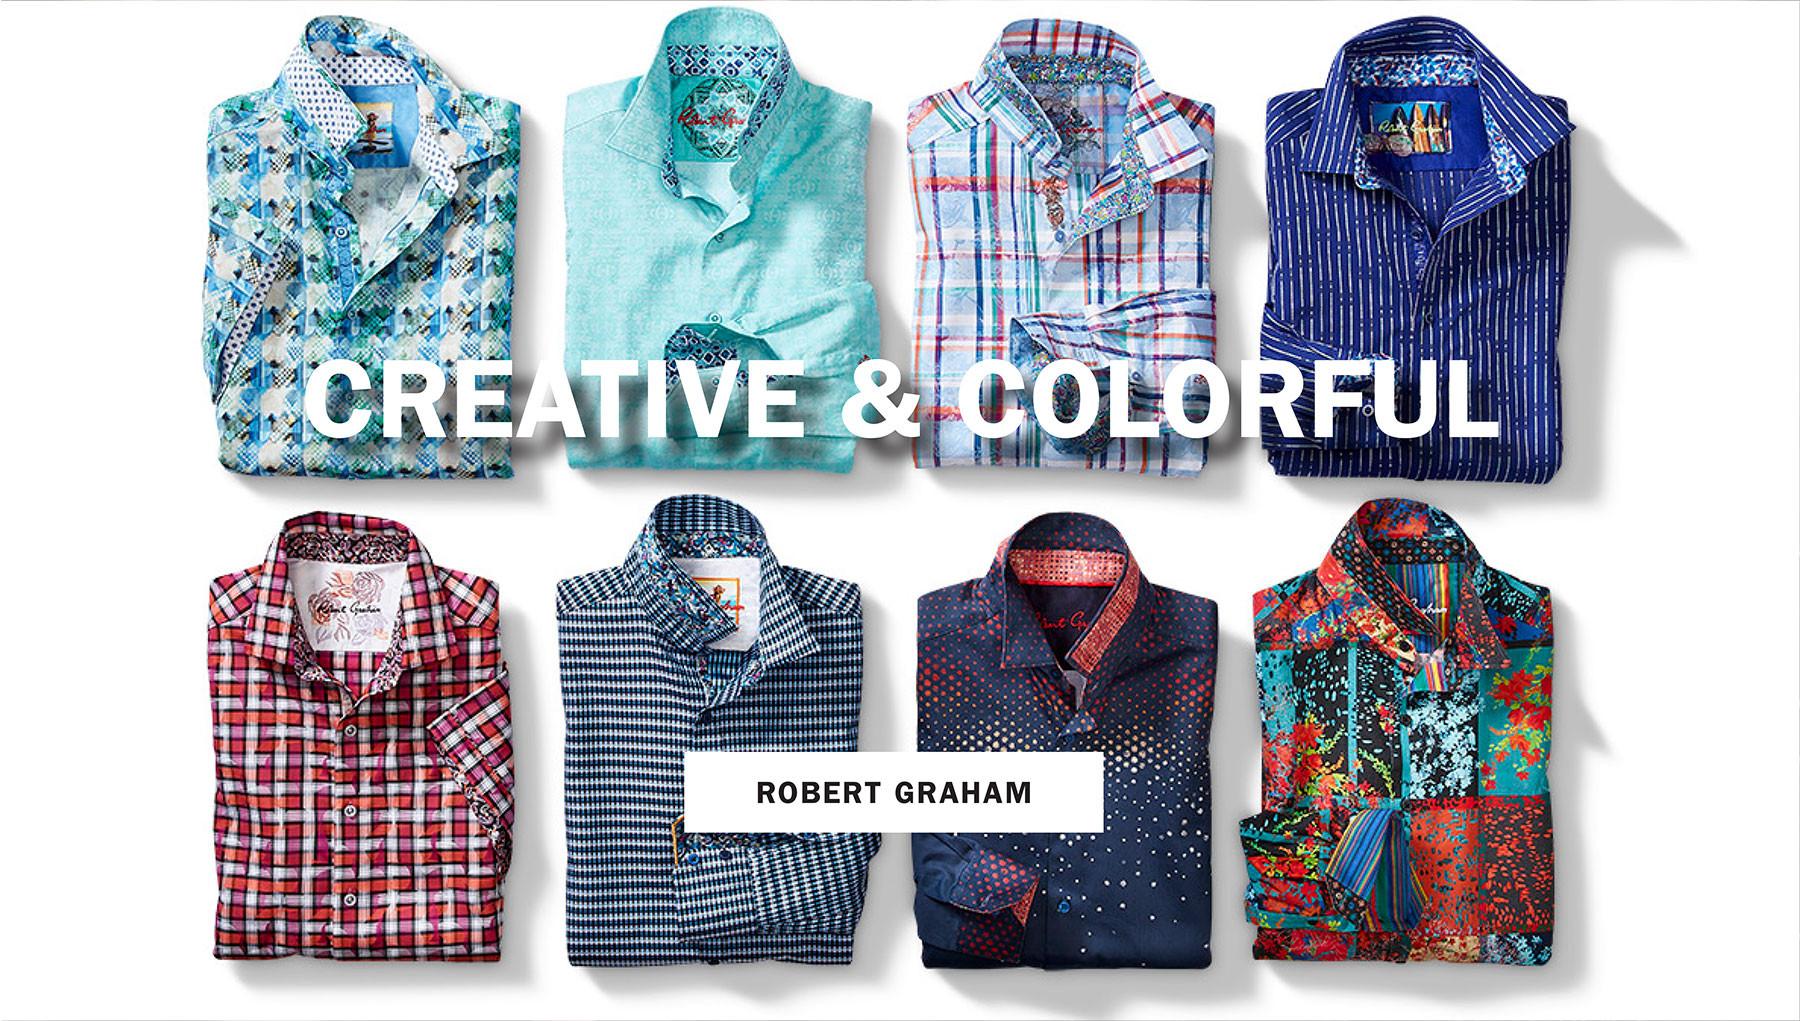 CREATIVE & COLORFUL   ROBERT GRAHAM